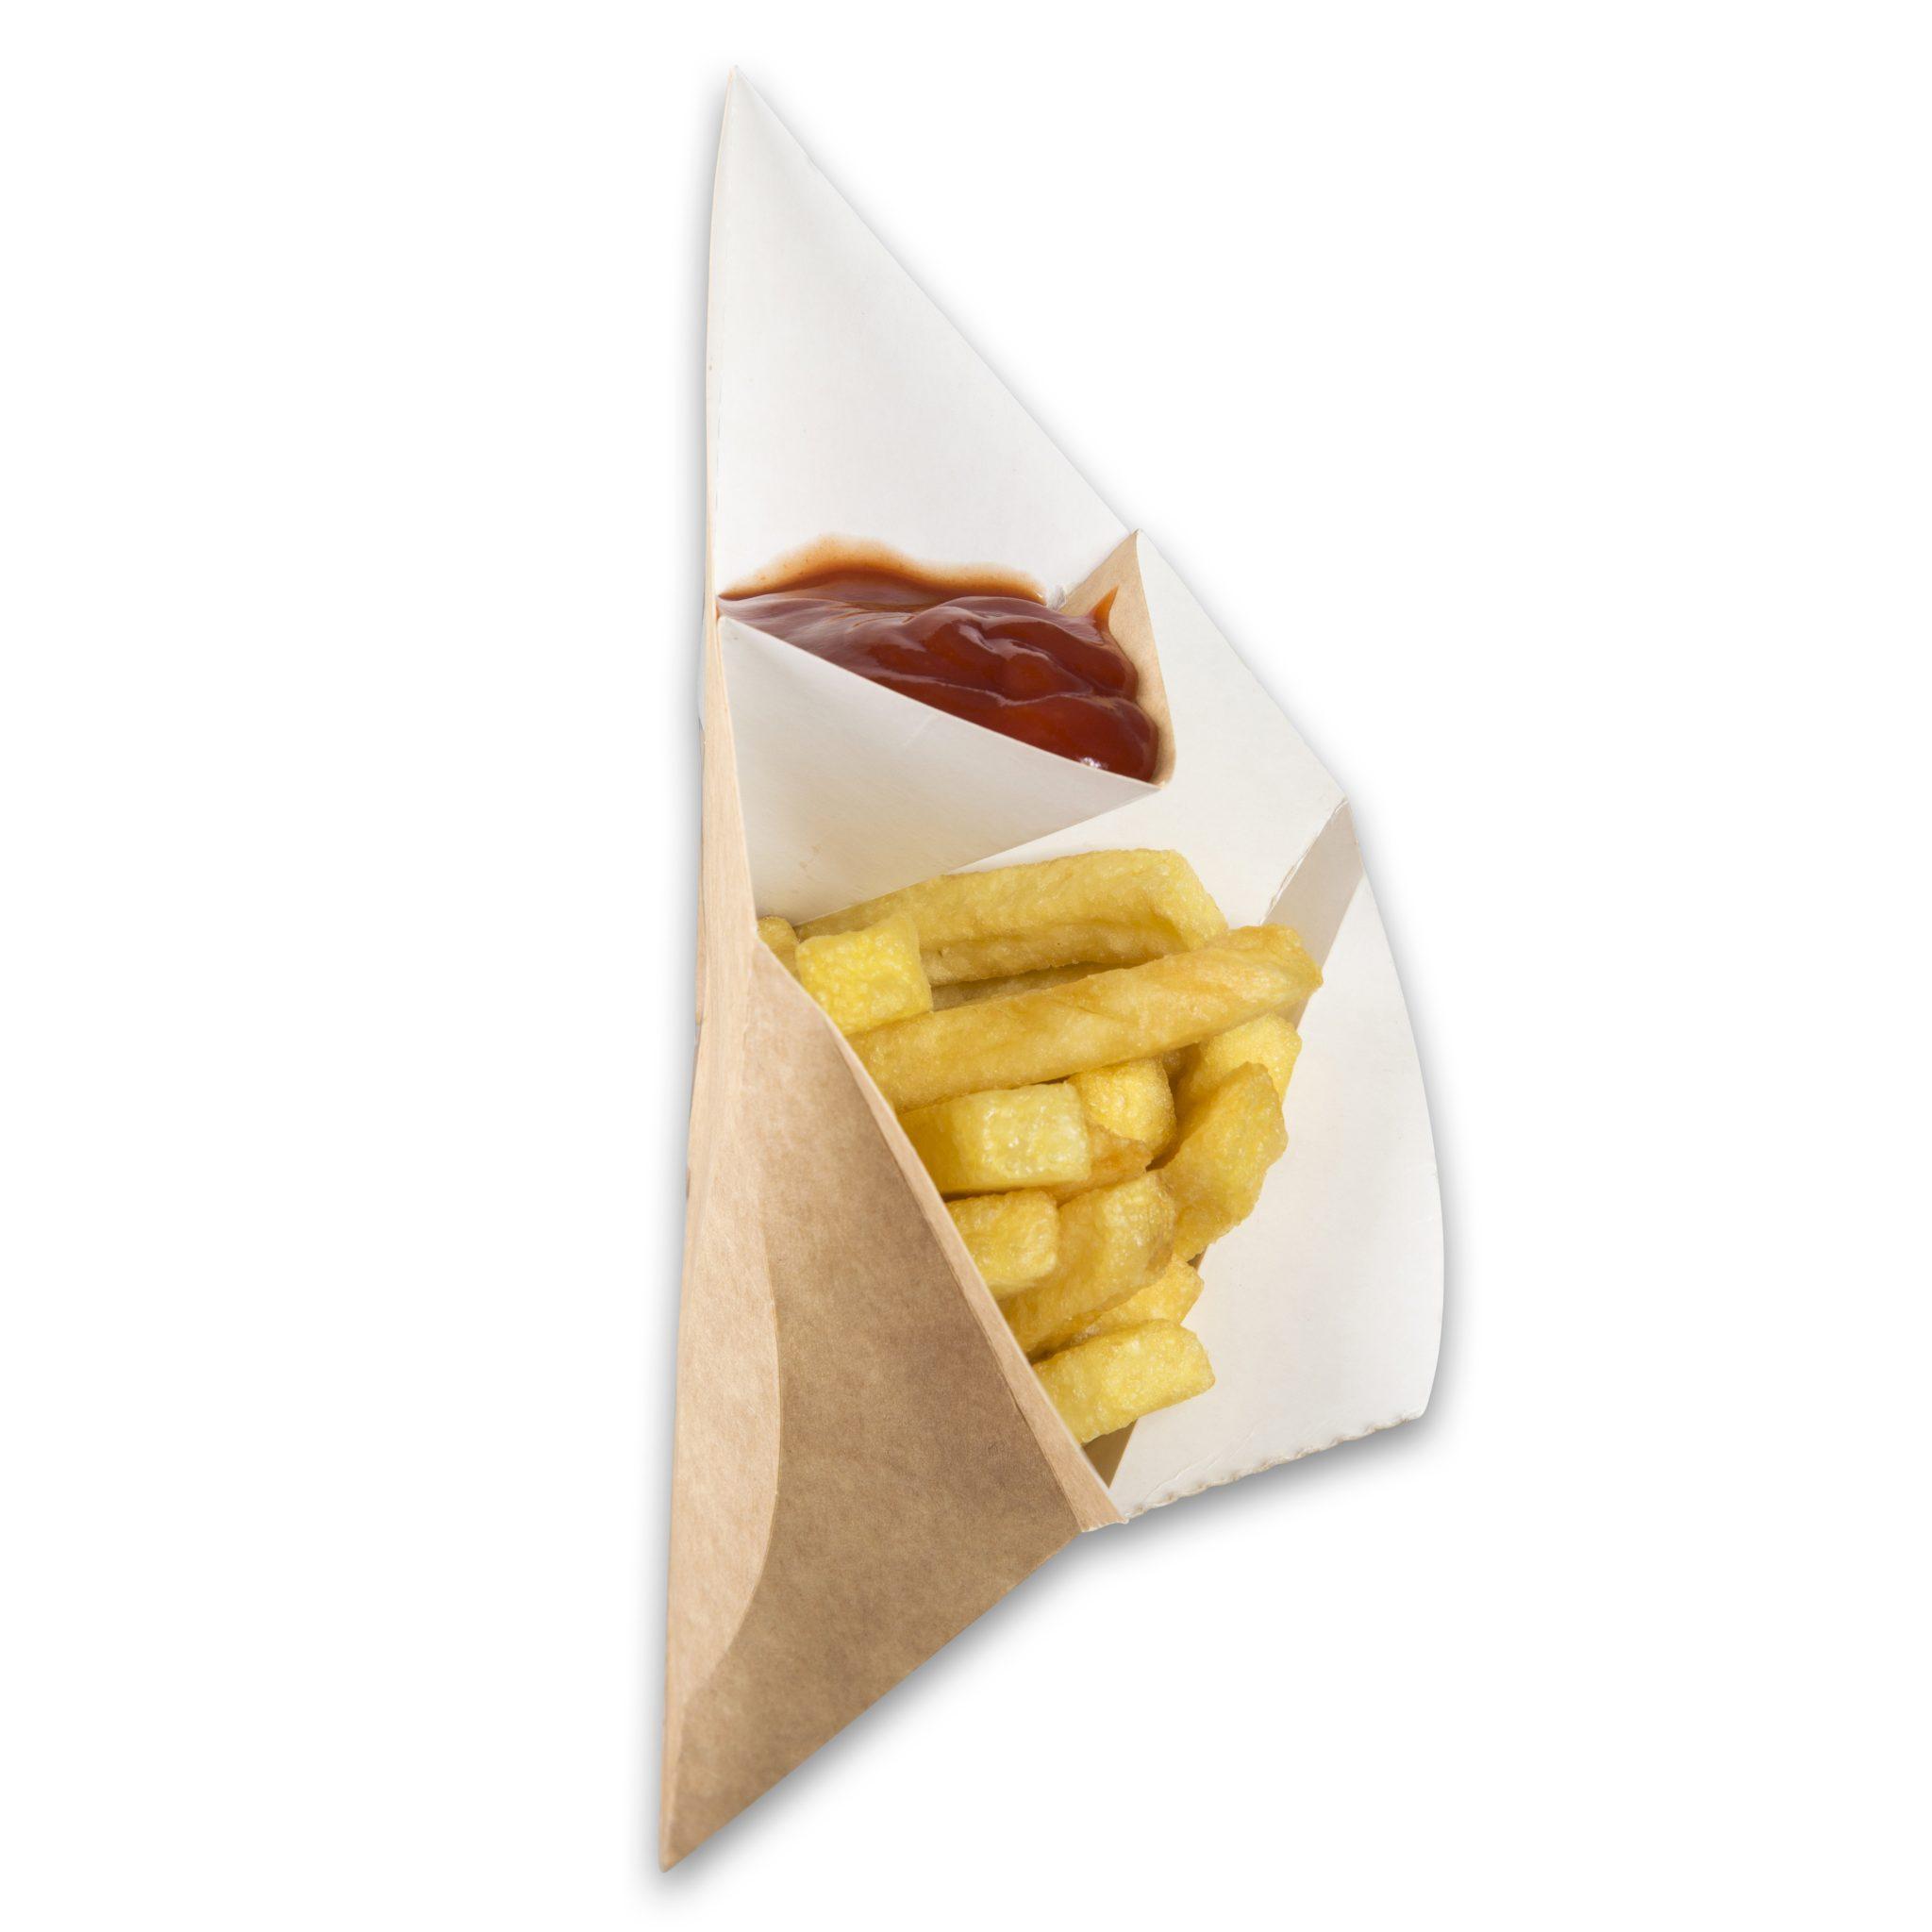 Kraft karton Frietzak met sausvak small 212x164x141 mm snackverpakking Chip 'n Dip klein (4)